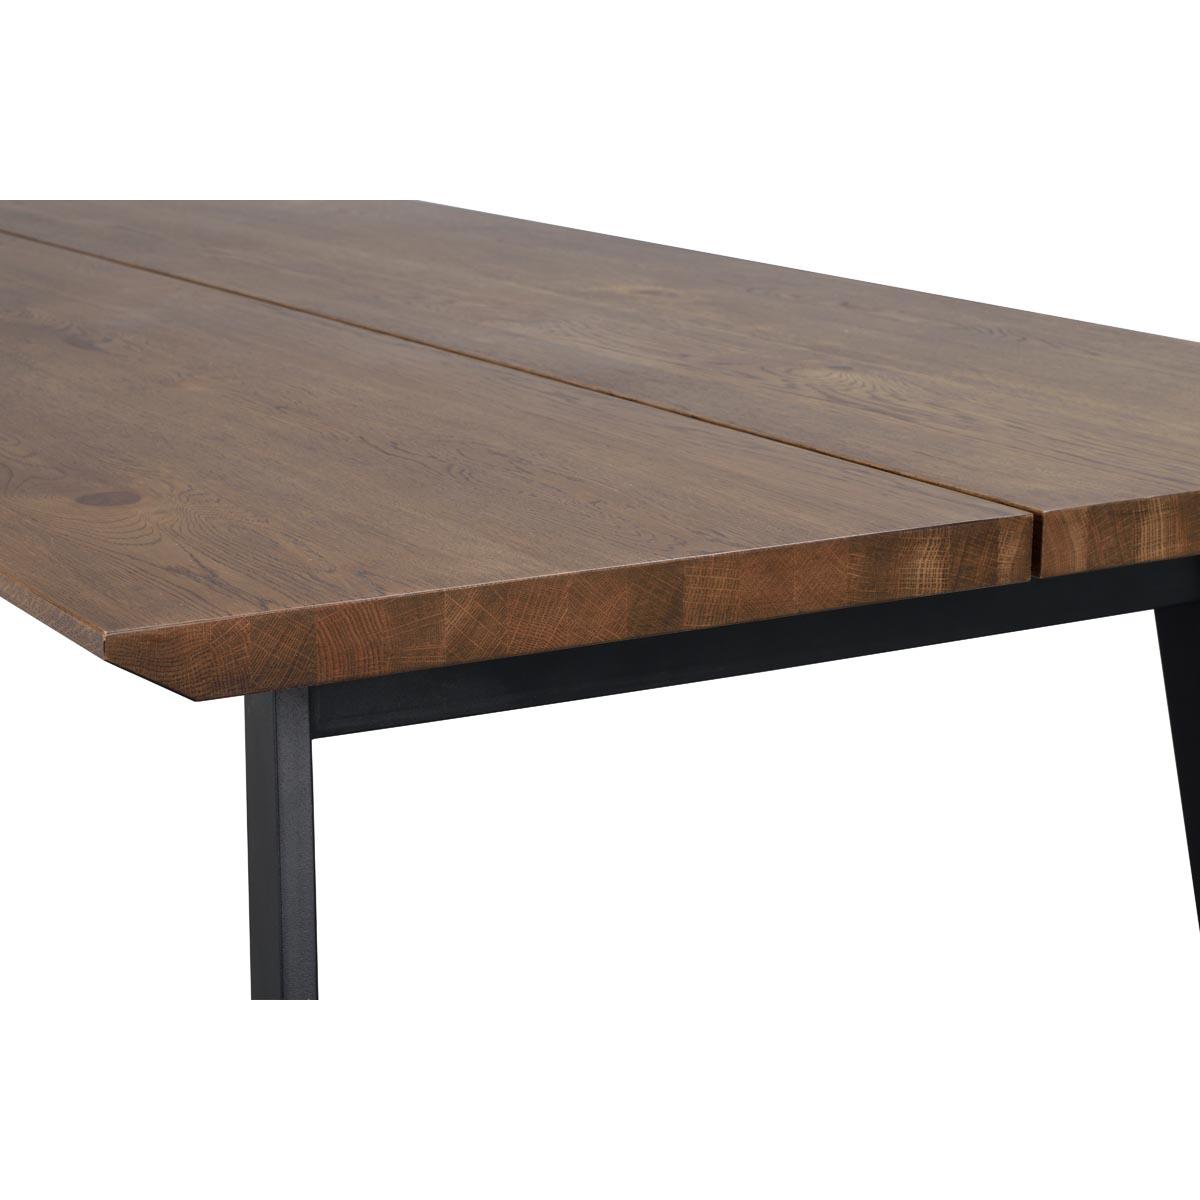 Melville-matbord-brunbets-vildek-119374_detalj